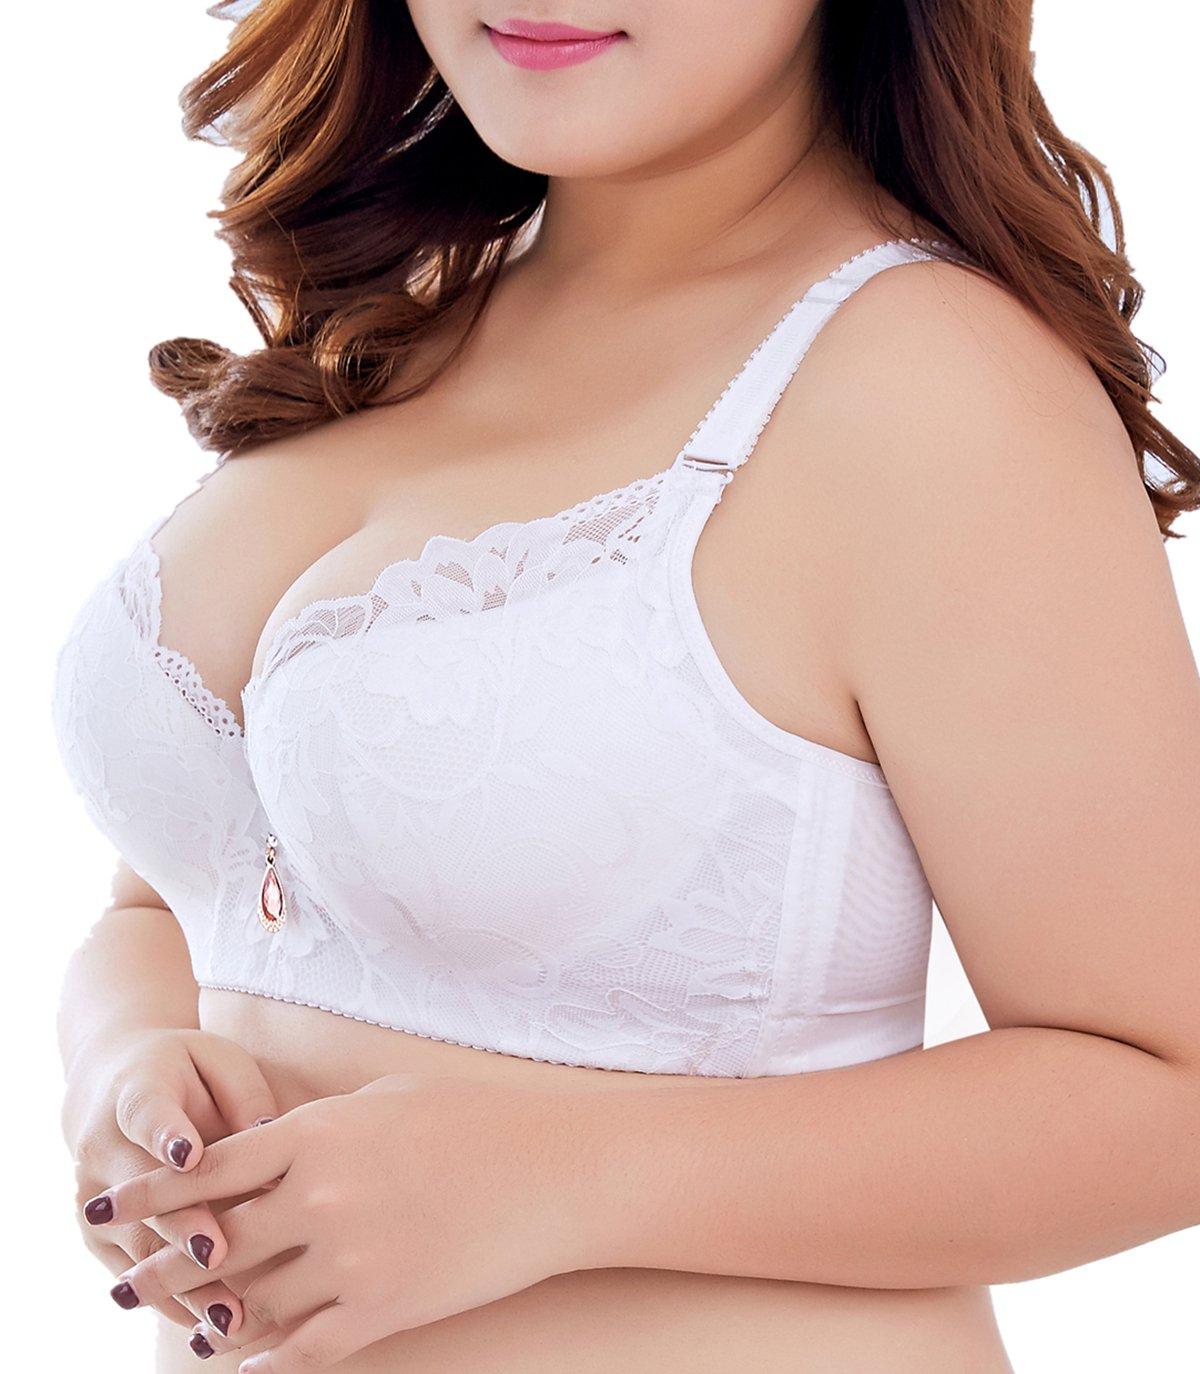 f8853d248b172 SEA BBOT Women Lace Push-up Bra Plus Size Floral Underwire Soft Cup  Everyday Bra